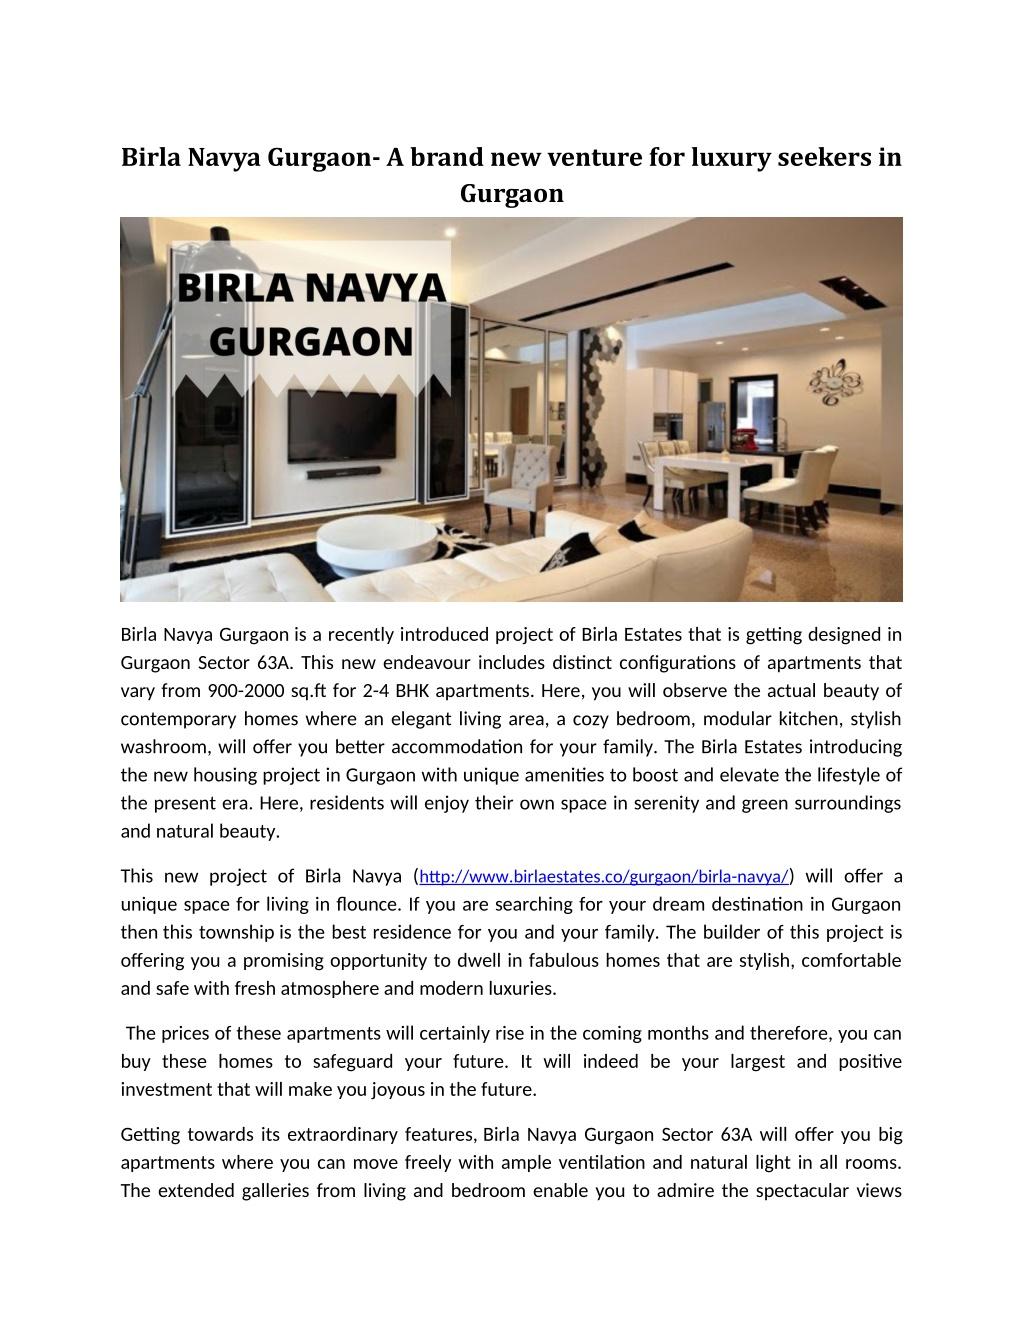 Birla Navya Gurgaon- A brand new venture for luxury seekers in Gurgaon